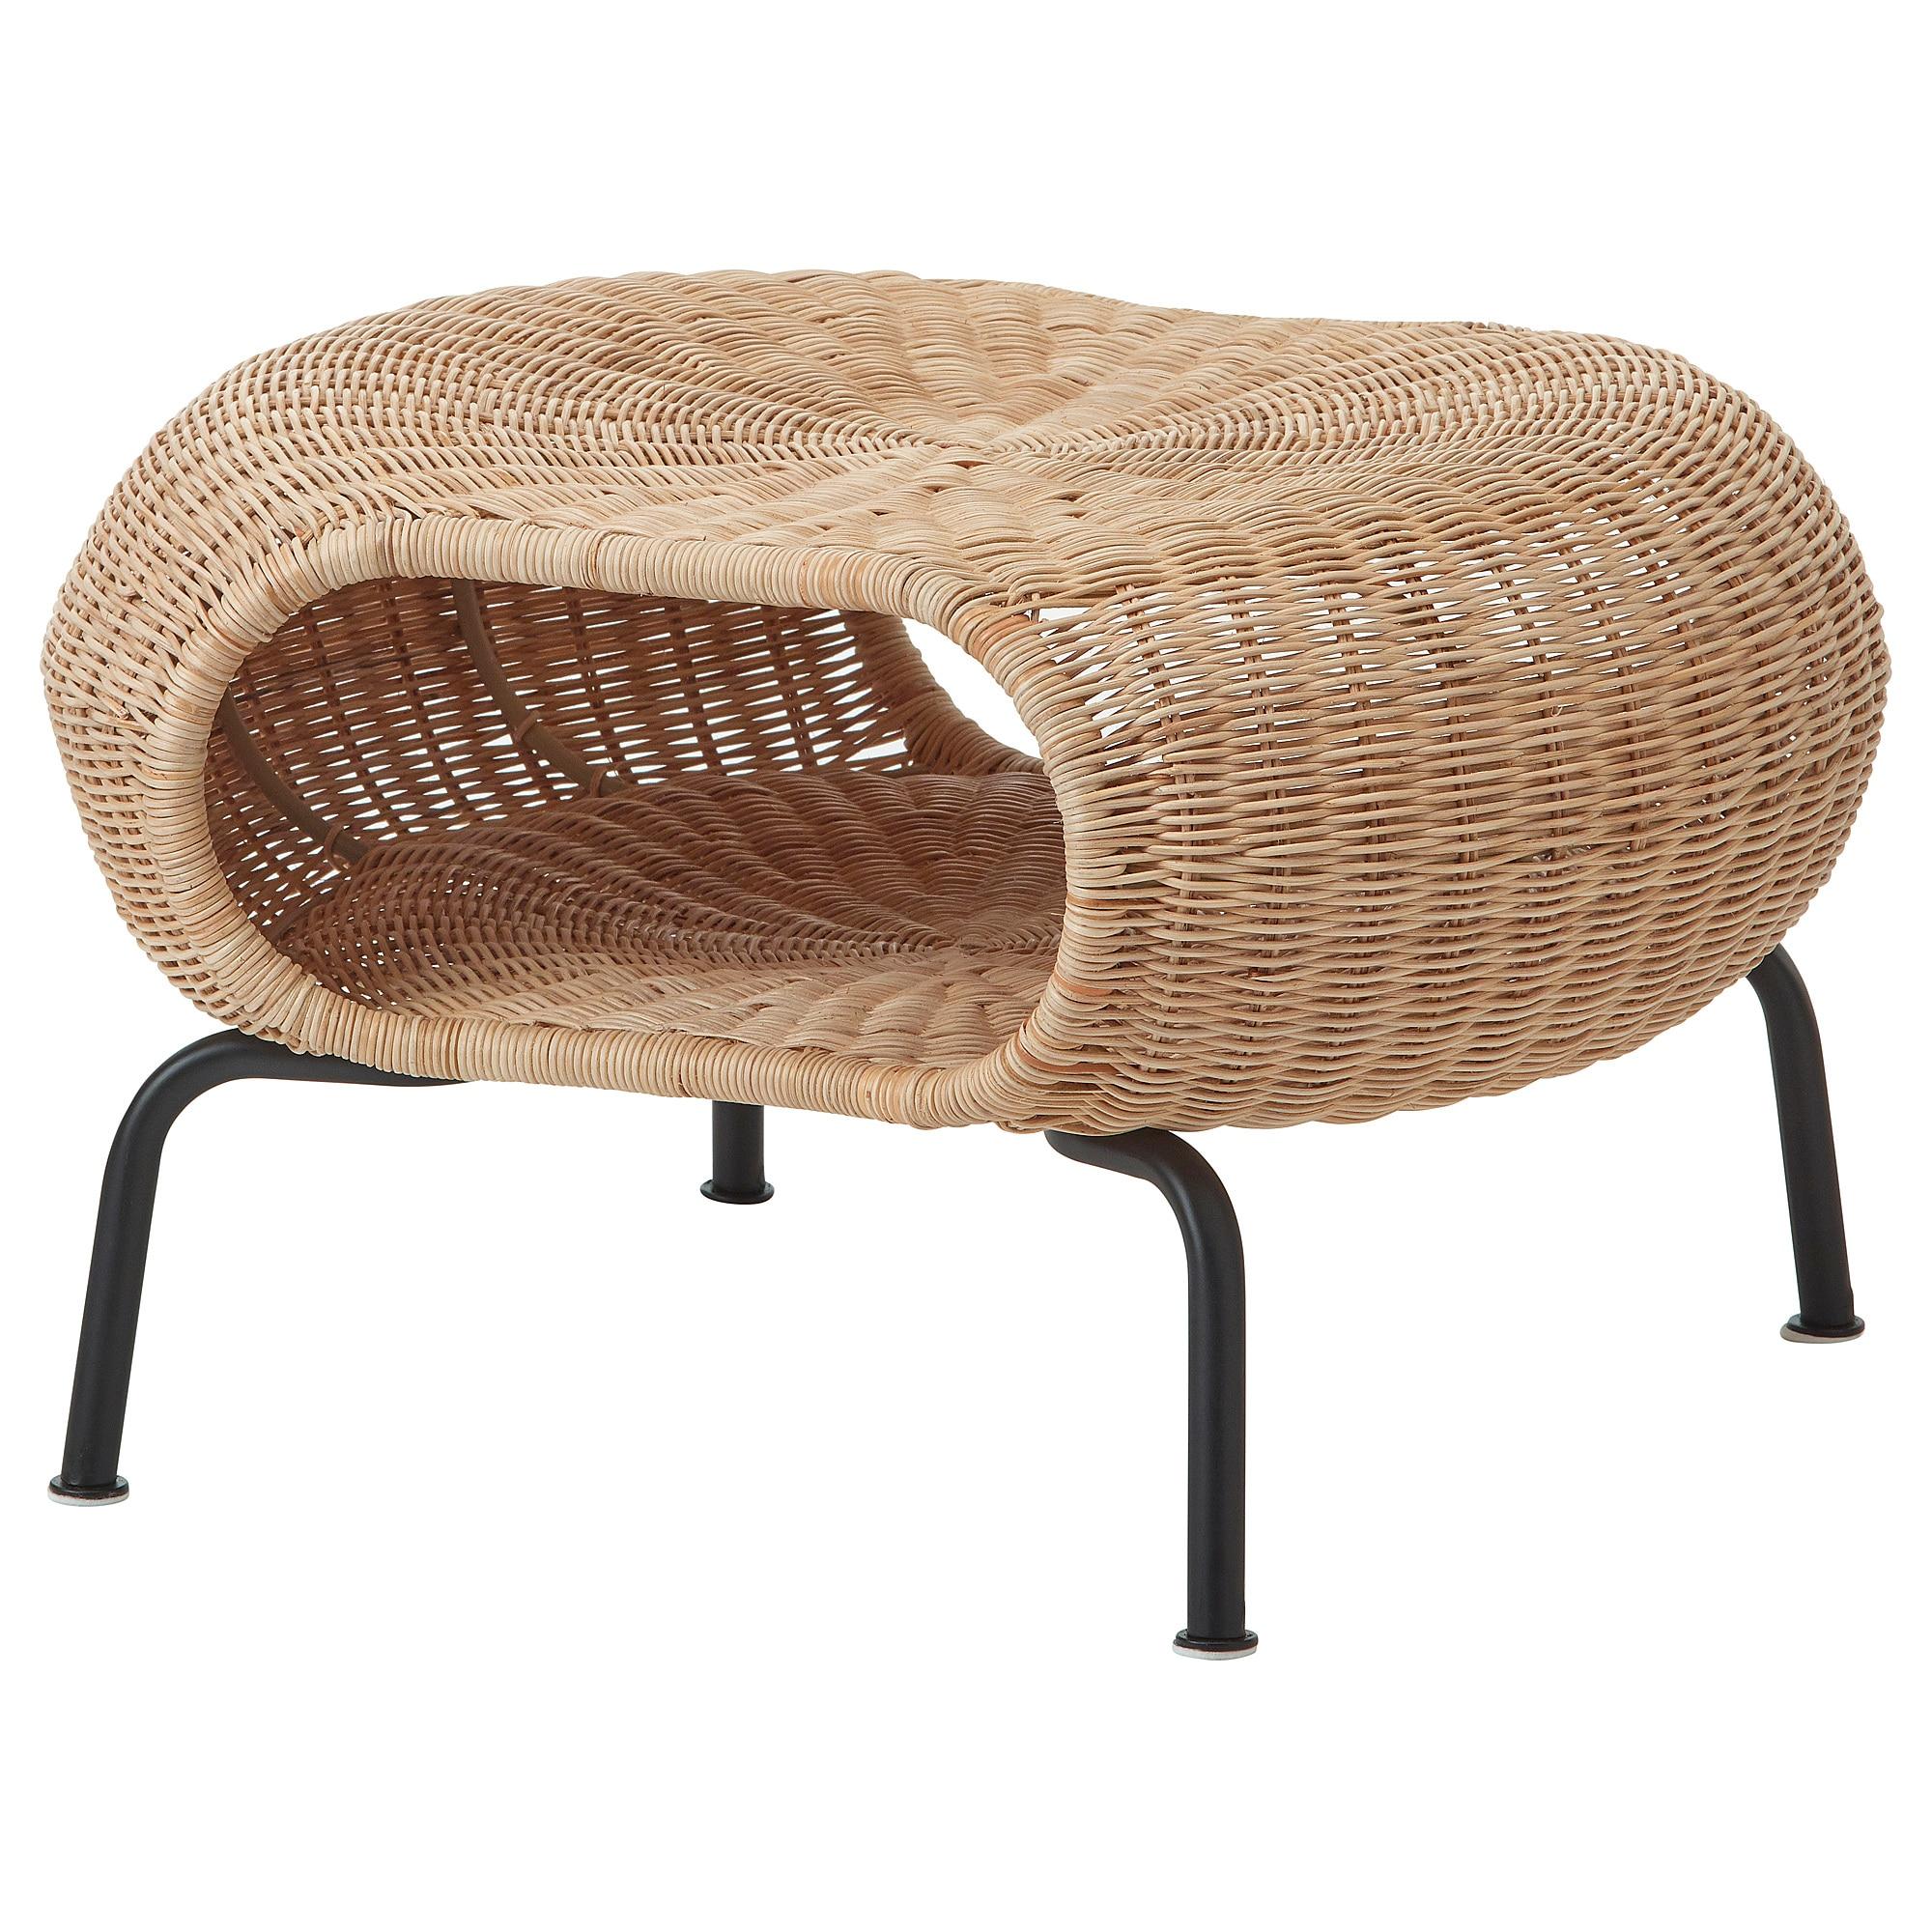 Tremendous Gamlehult Ottoman With Storage Rattan Anthracite In 2019 Inzonedesignstudio Interior Chair Design Inzonedesignstudiocom